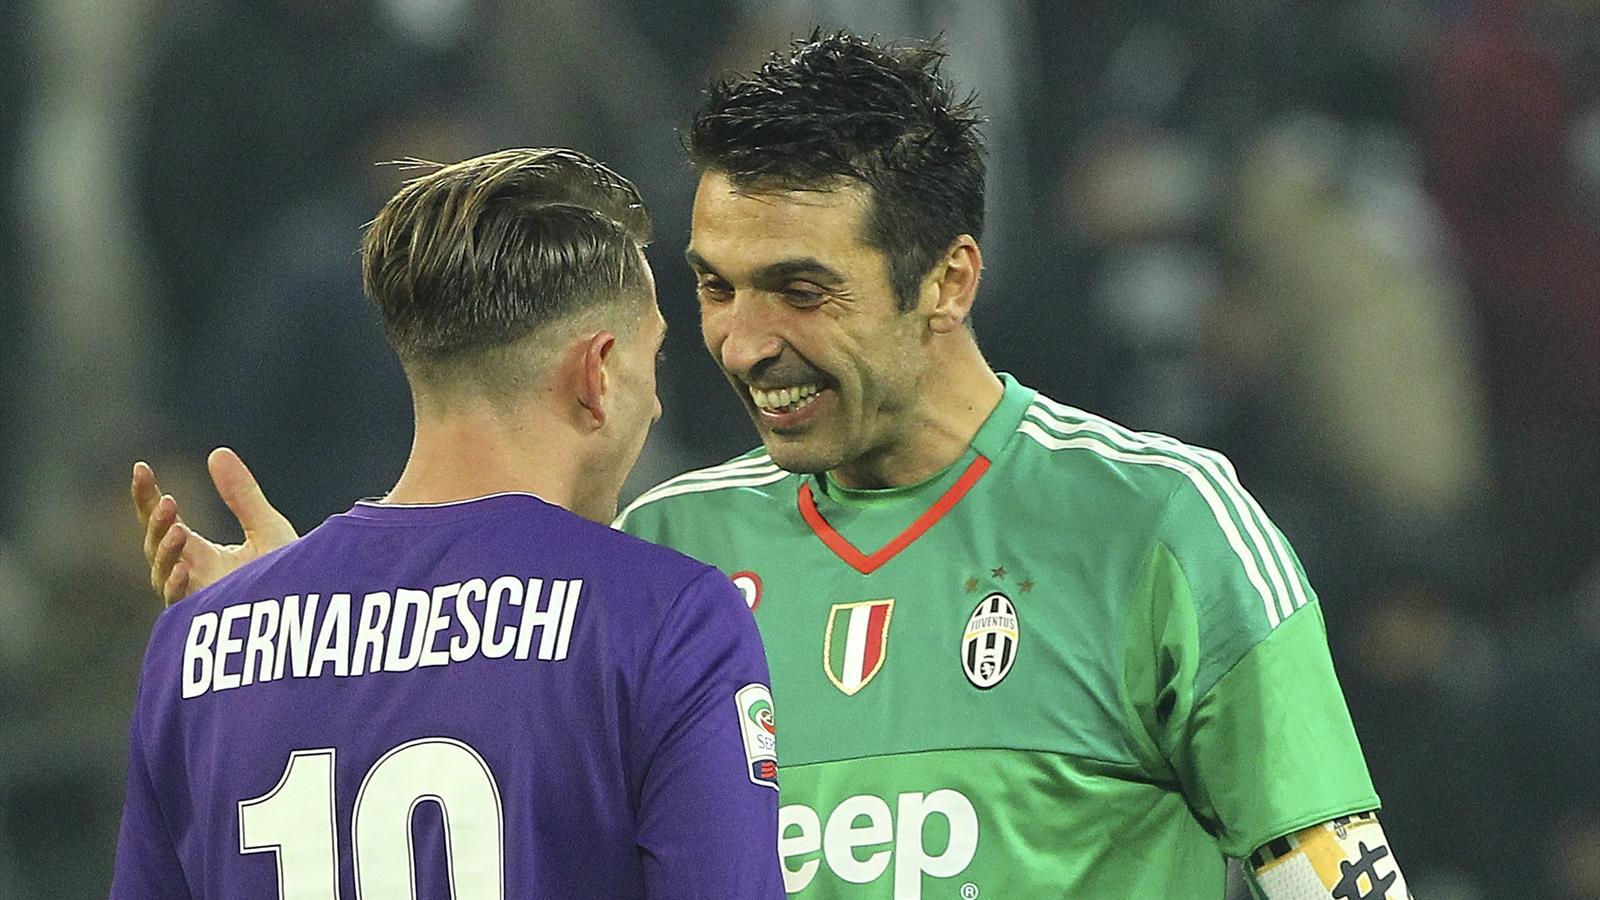 Juventus sign Federico Bernardeschi on five year contract Serie